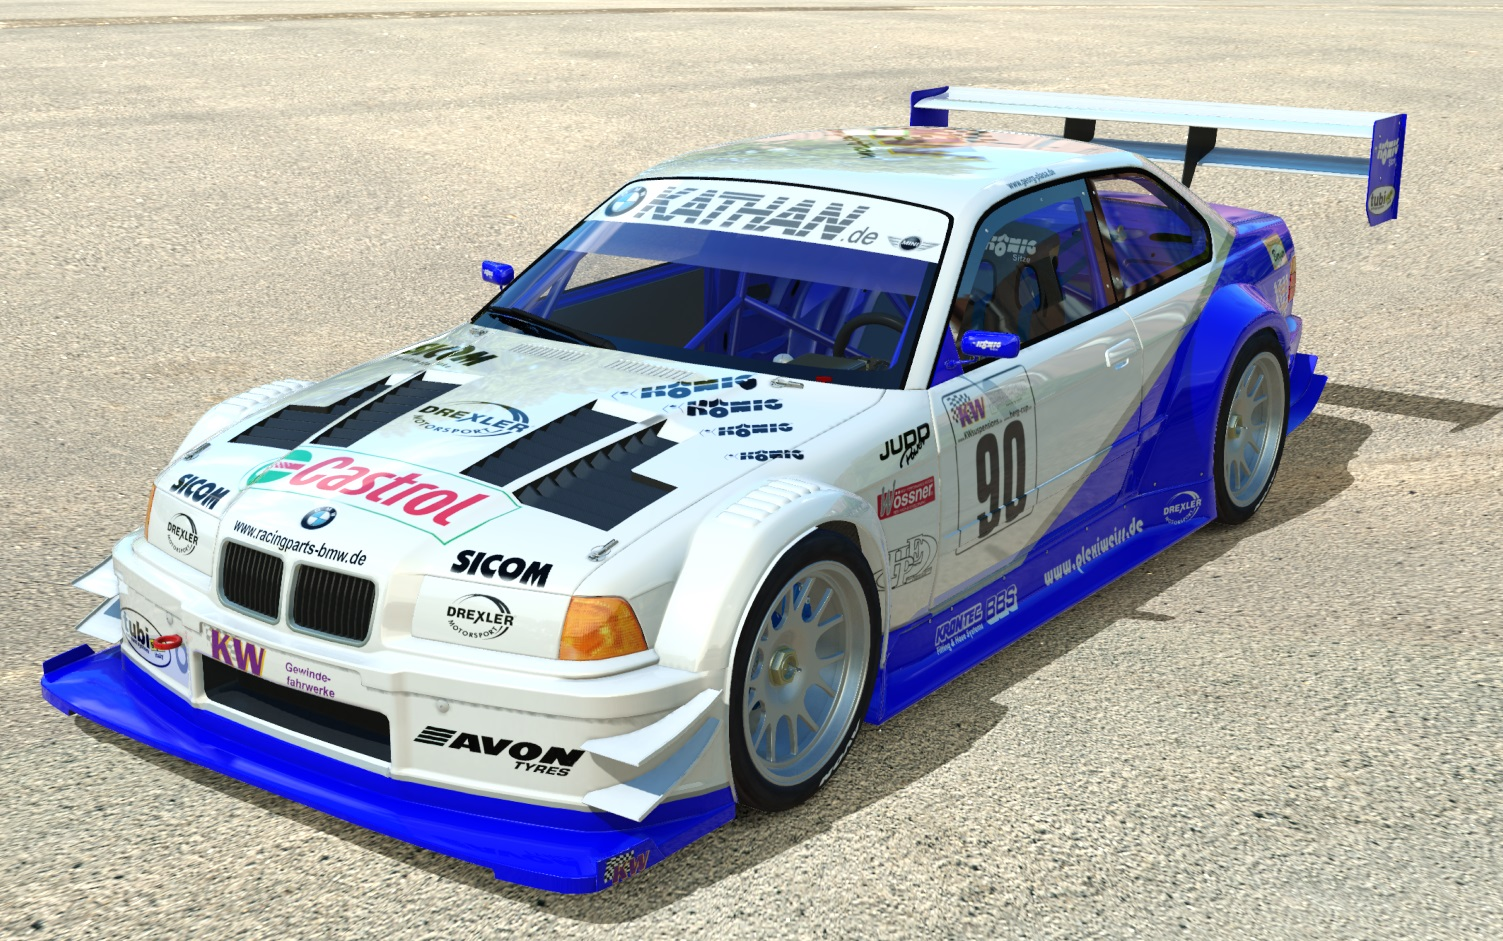 BMW E36 320 JUDD V8 Georg Plasa | RaceDepartment - Latest